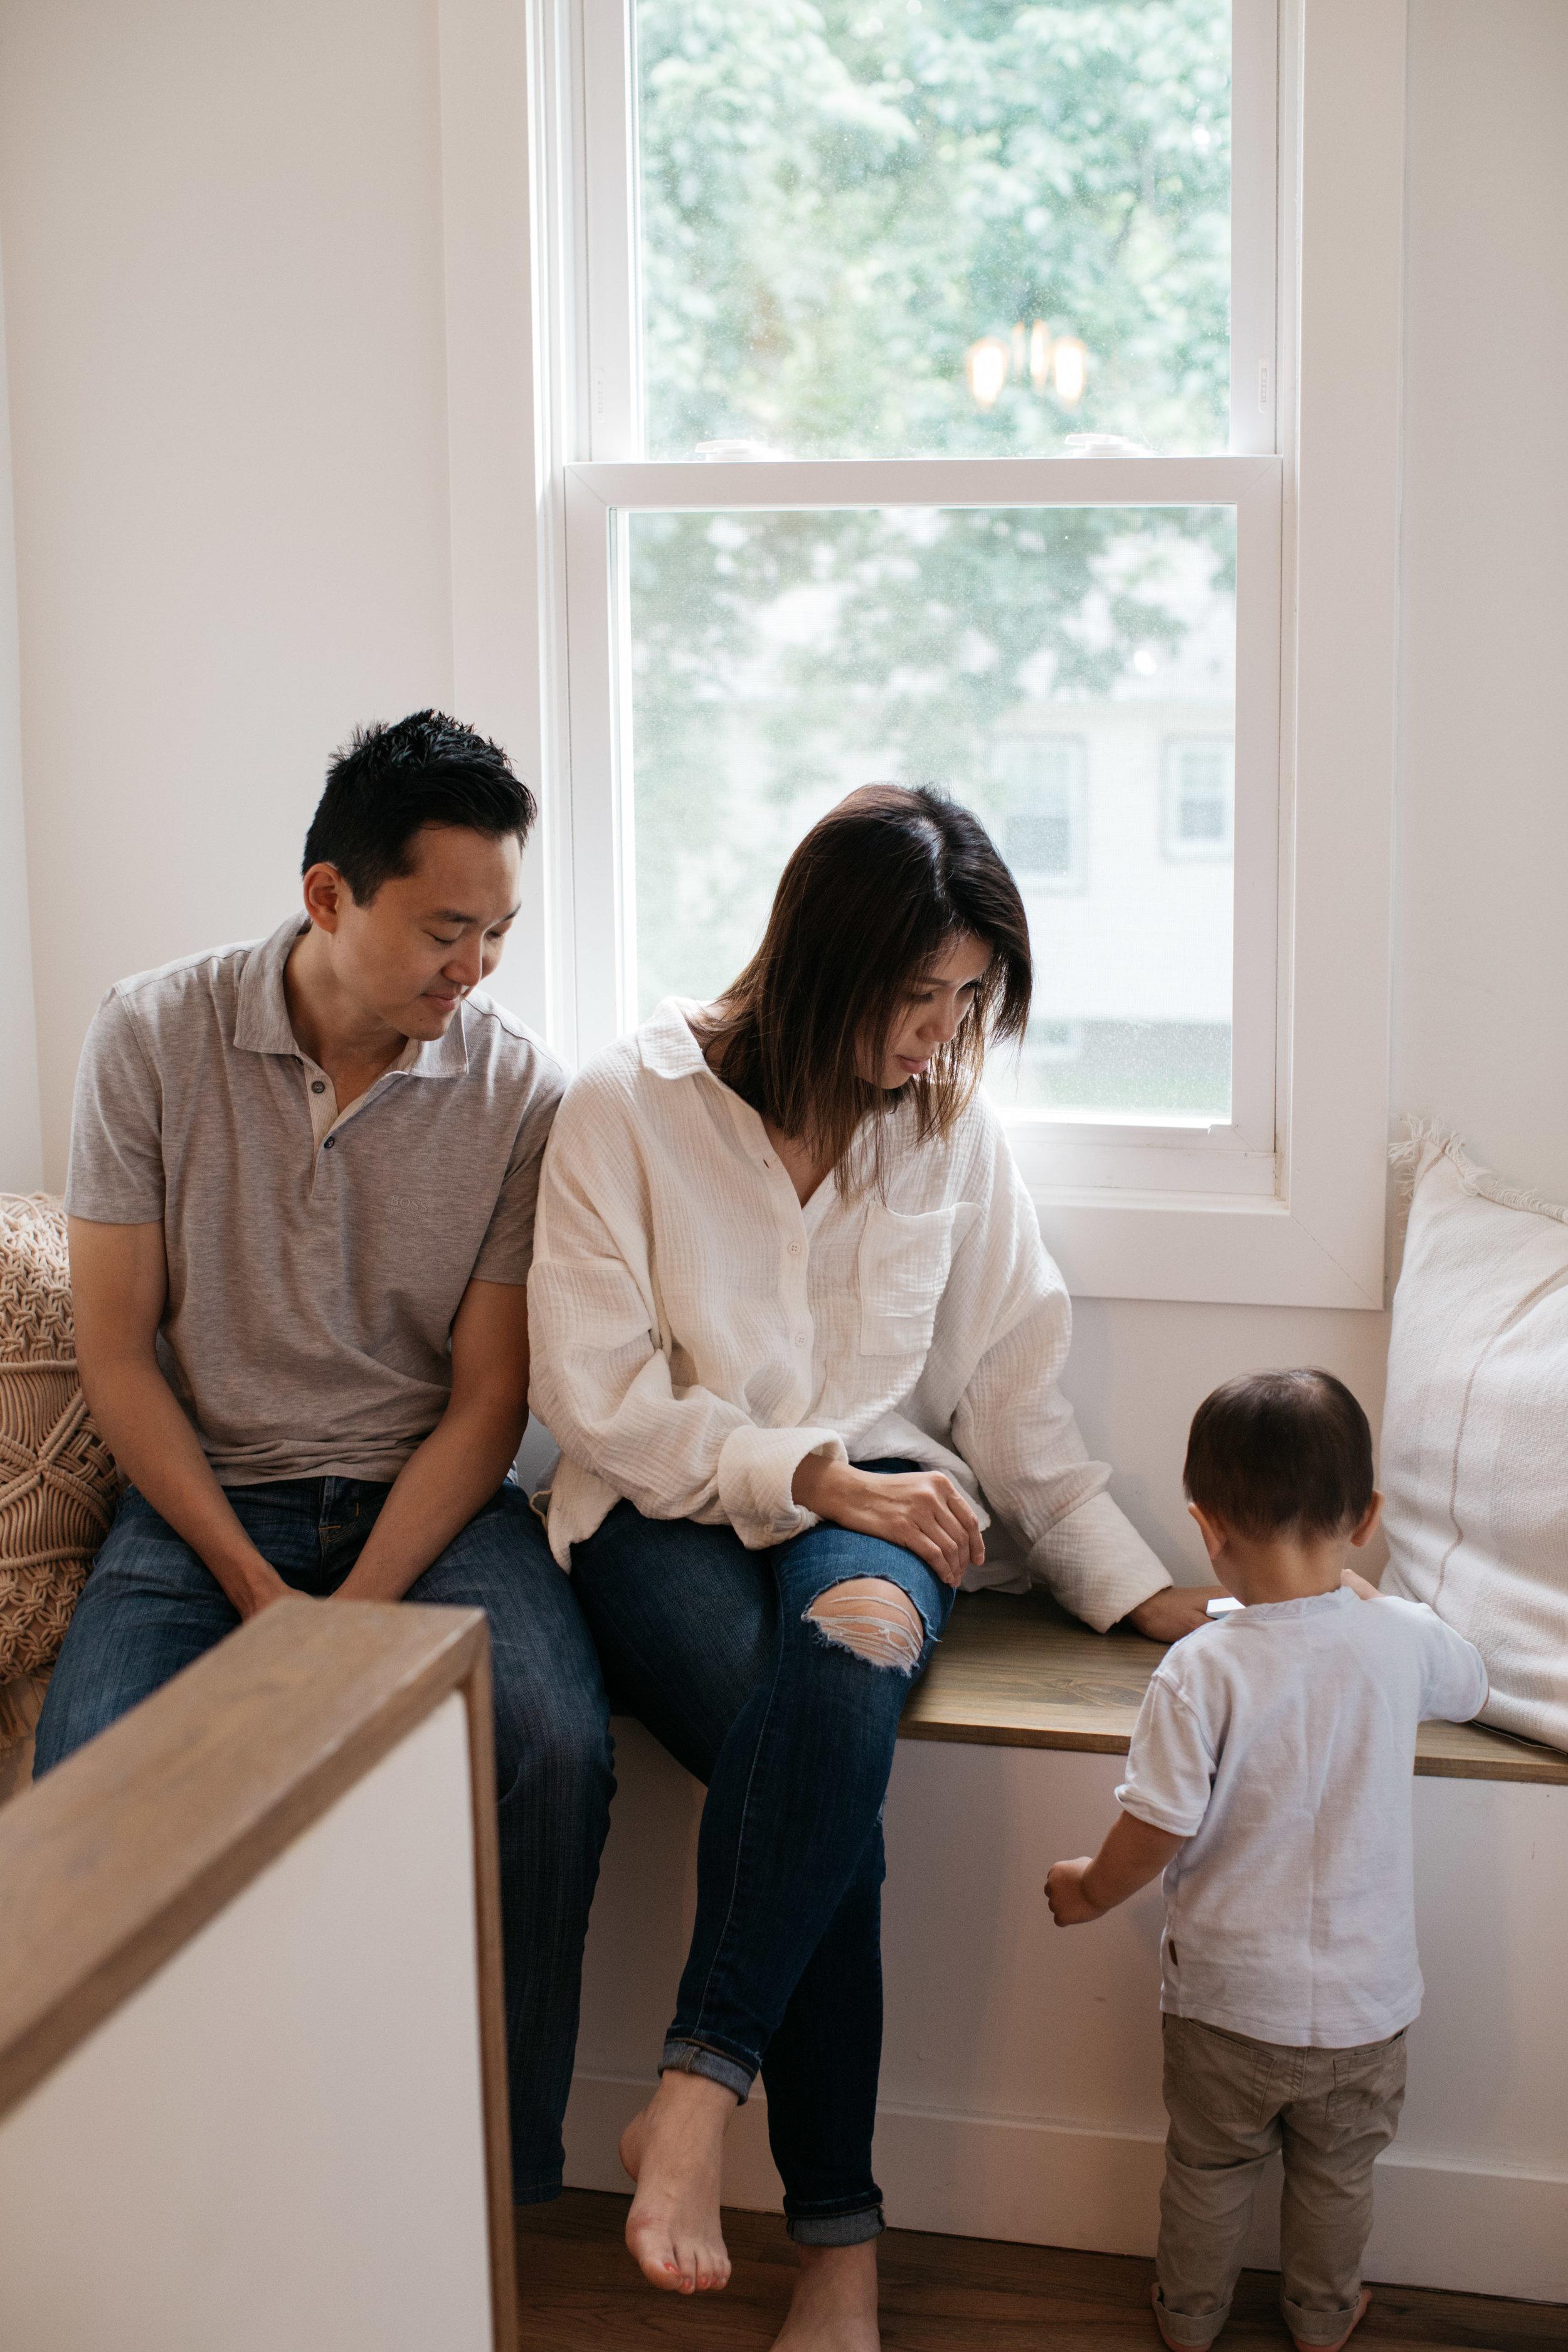 Sondy-Mok-Family-Documentary-Lifestyle-photos-New-Jersey-33.jpg